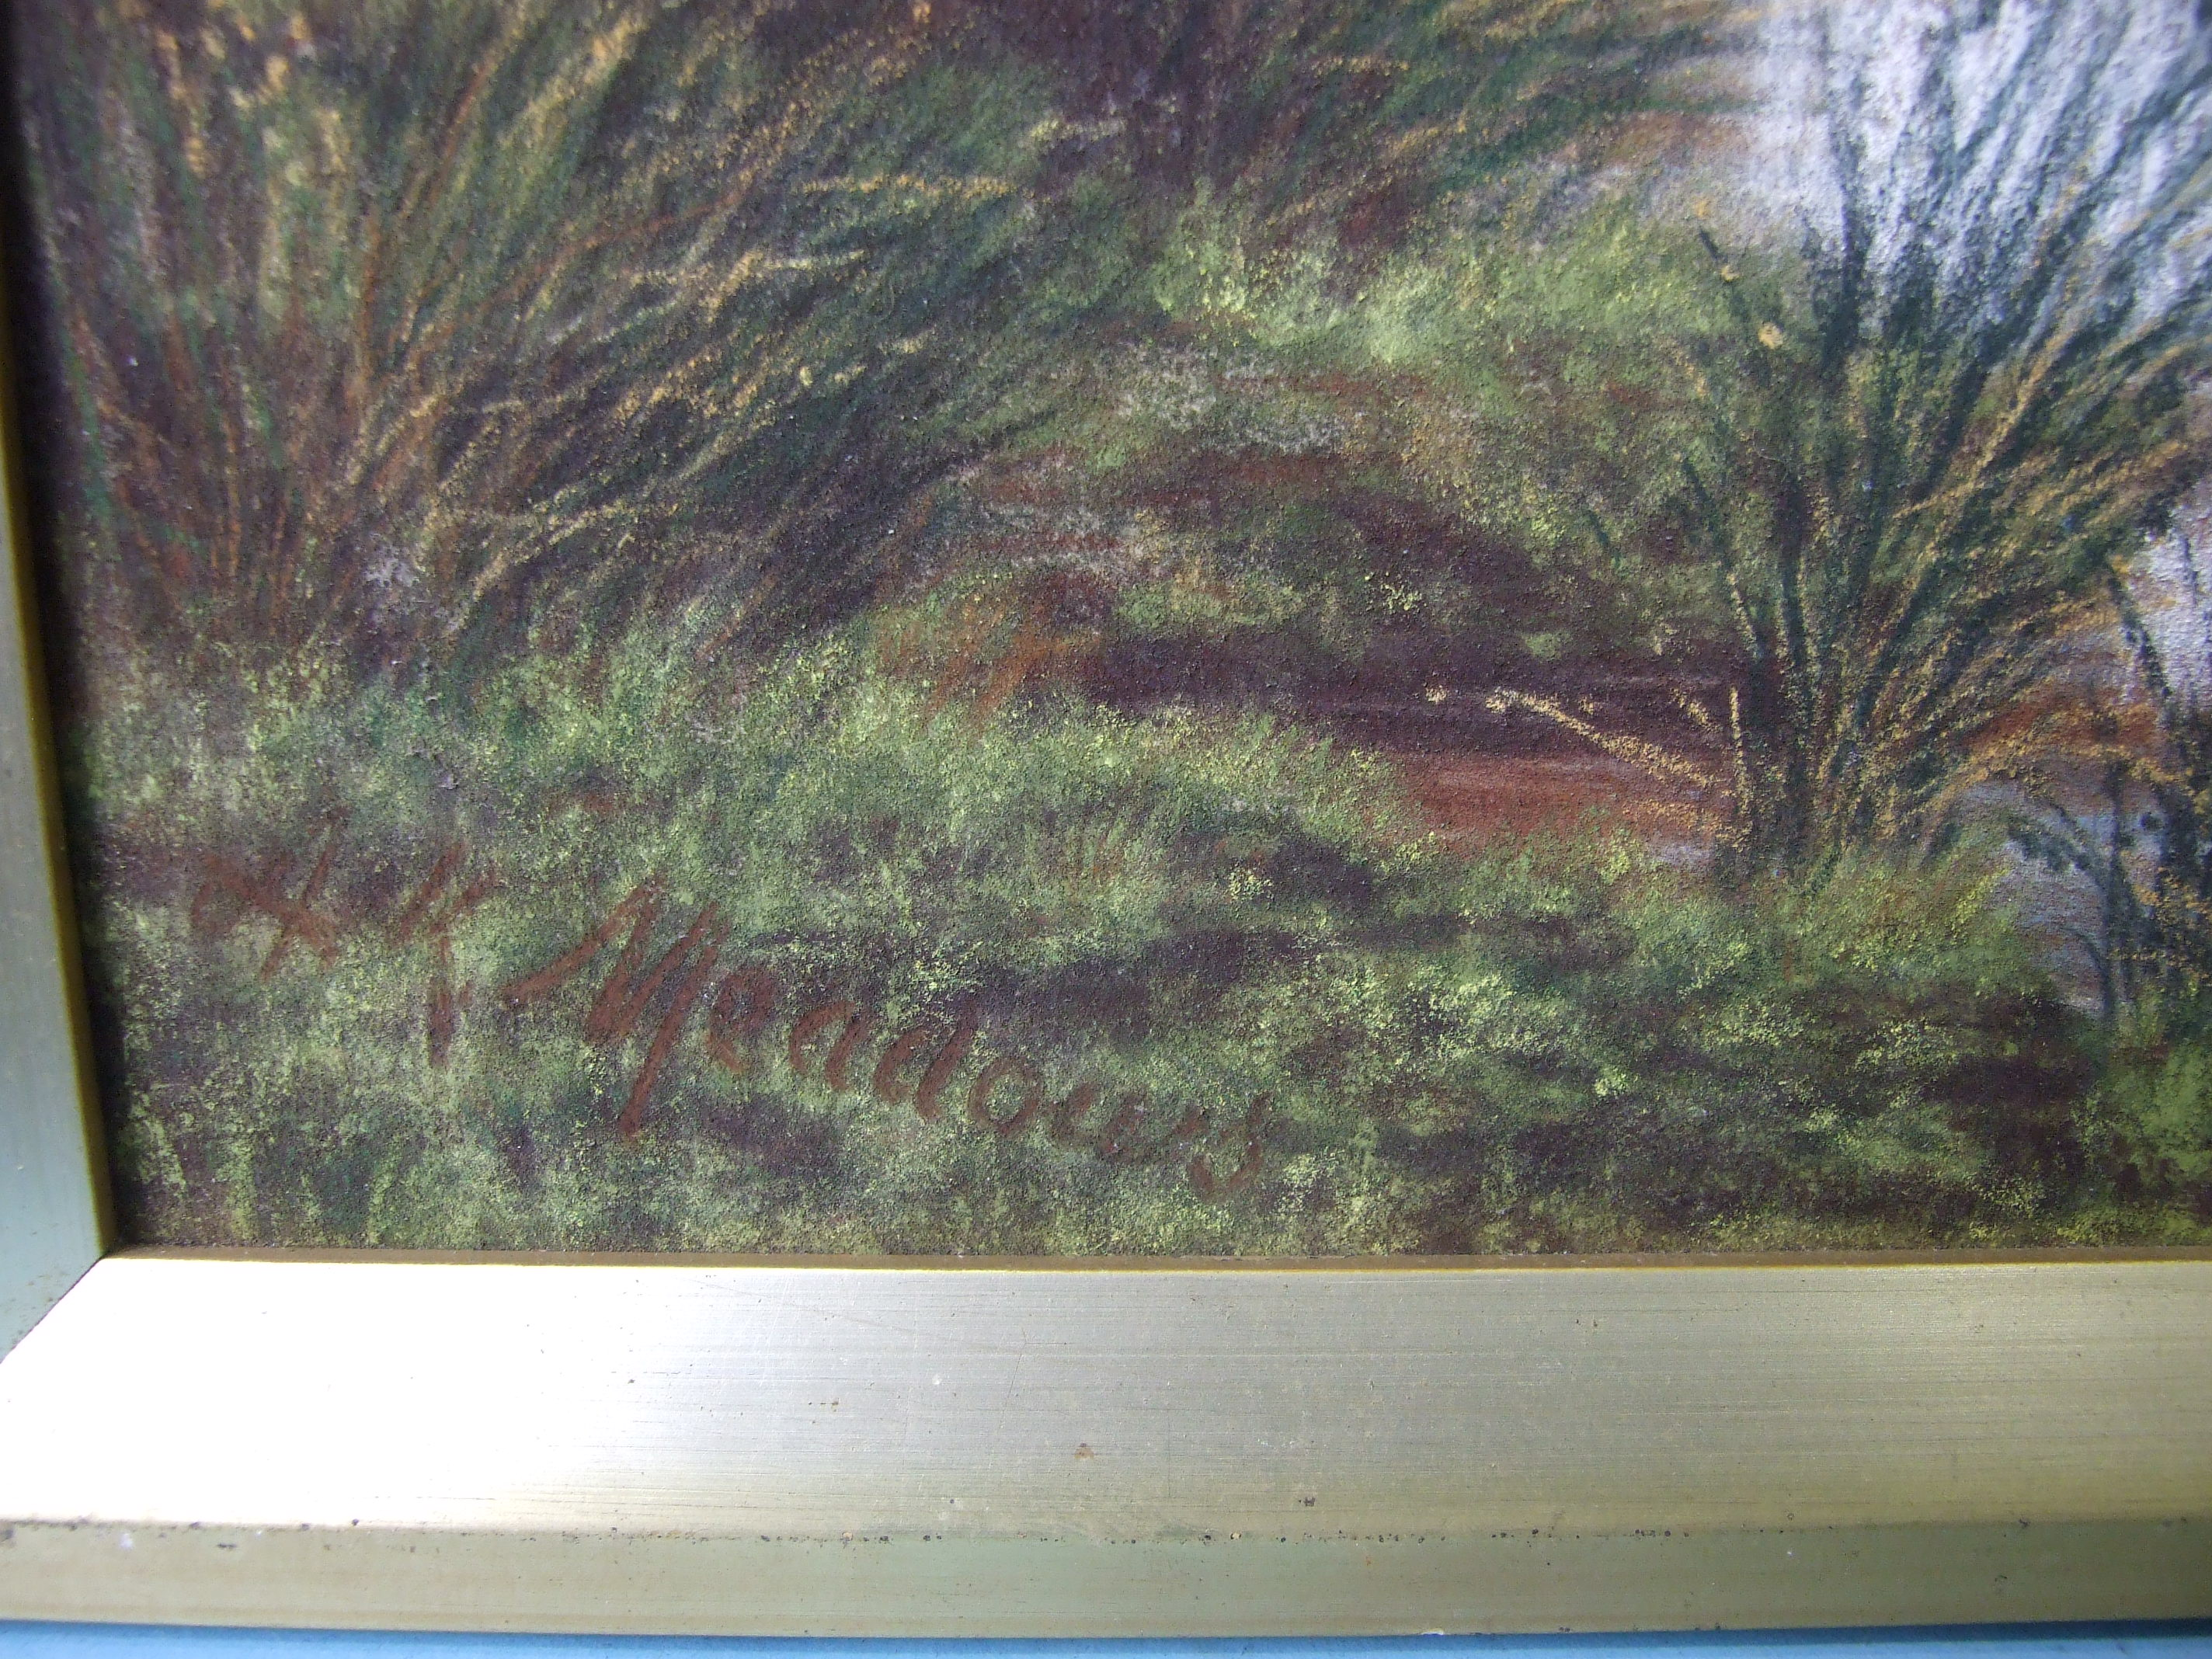 A K Meadows (19th/20th century), 'Looking towards Widgery Cross, Dartmoor', pastel, signed, 60 x - Image 2 of 4